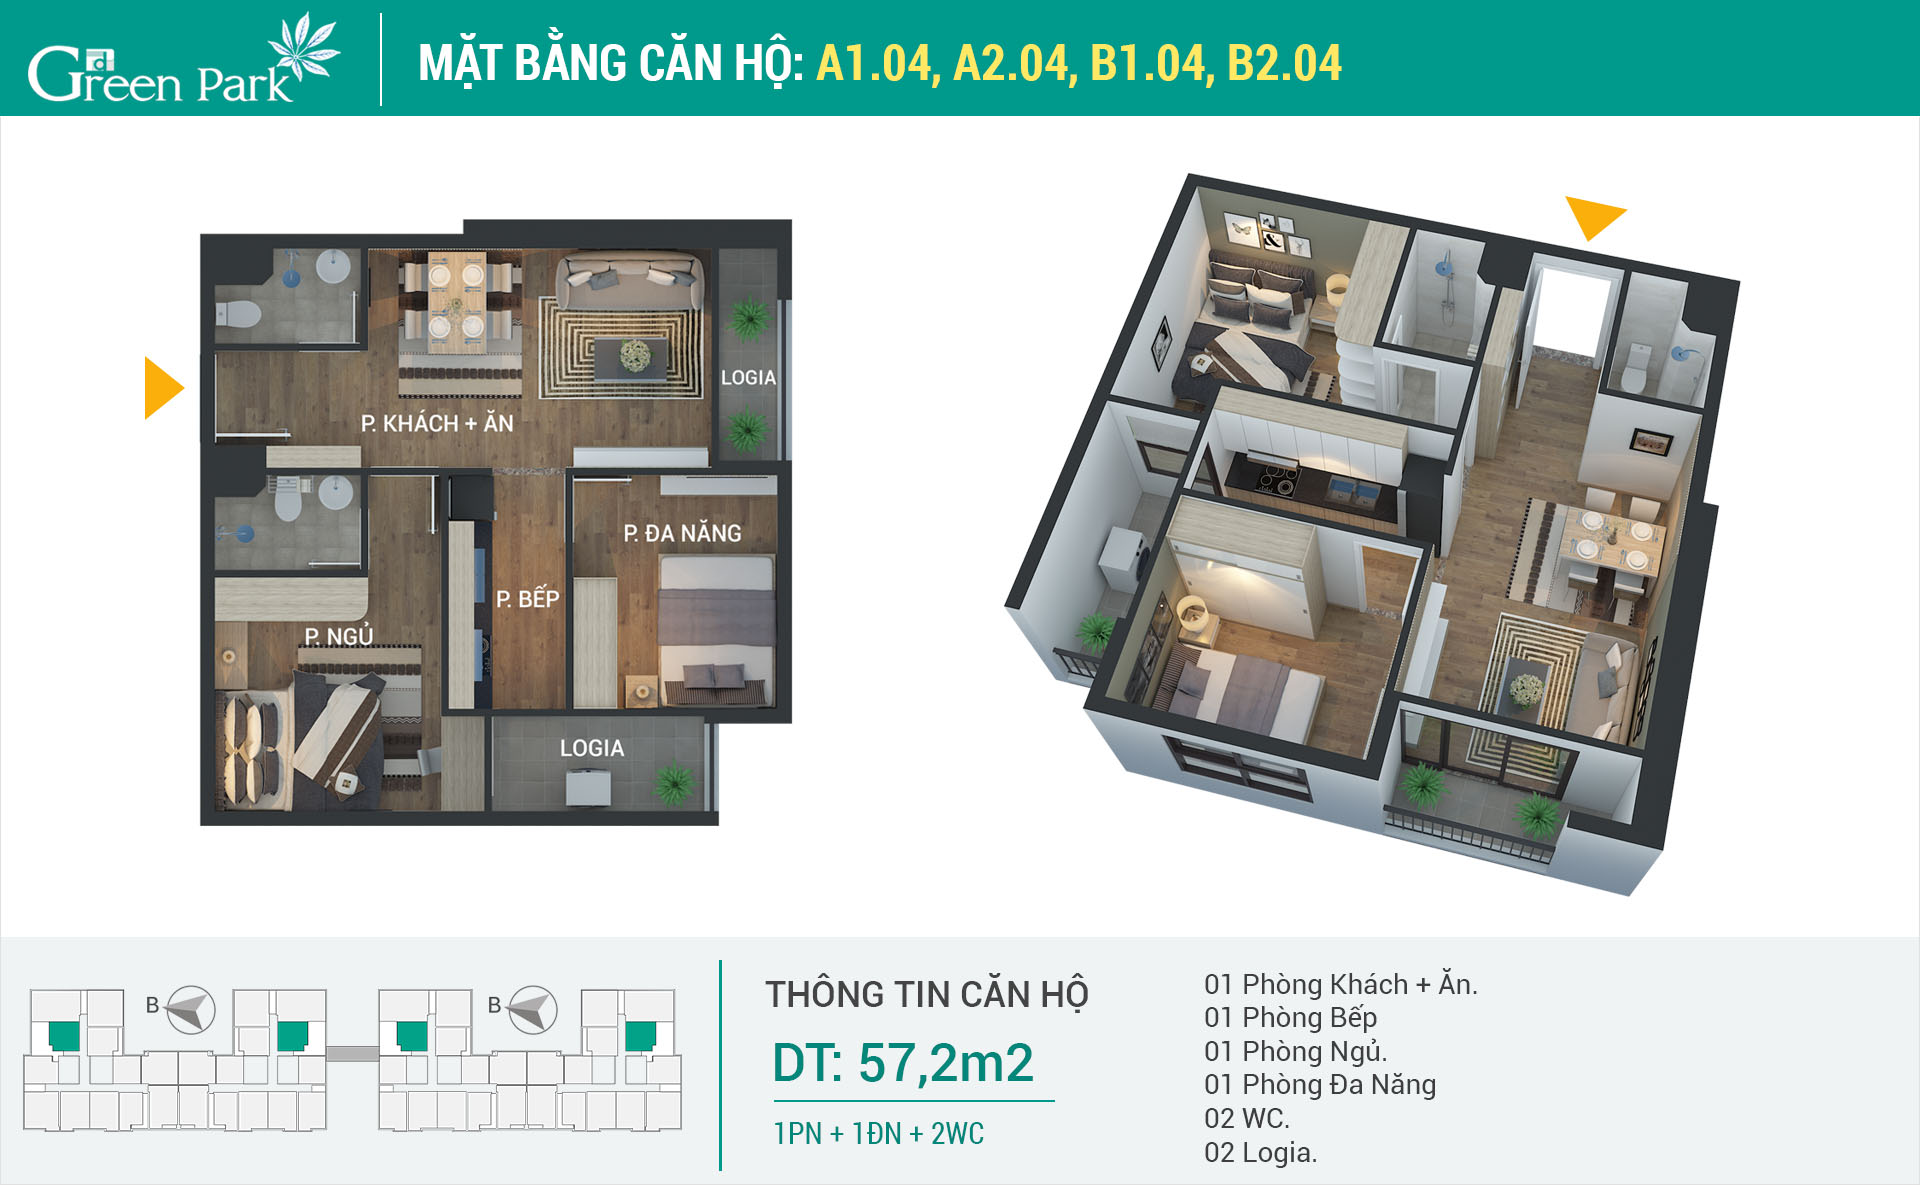 Mặt bằng căn hộ A1-04, A2-04, B1-04, B2-04